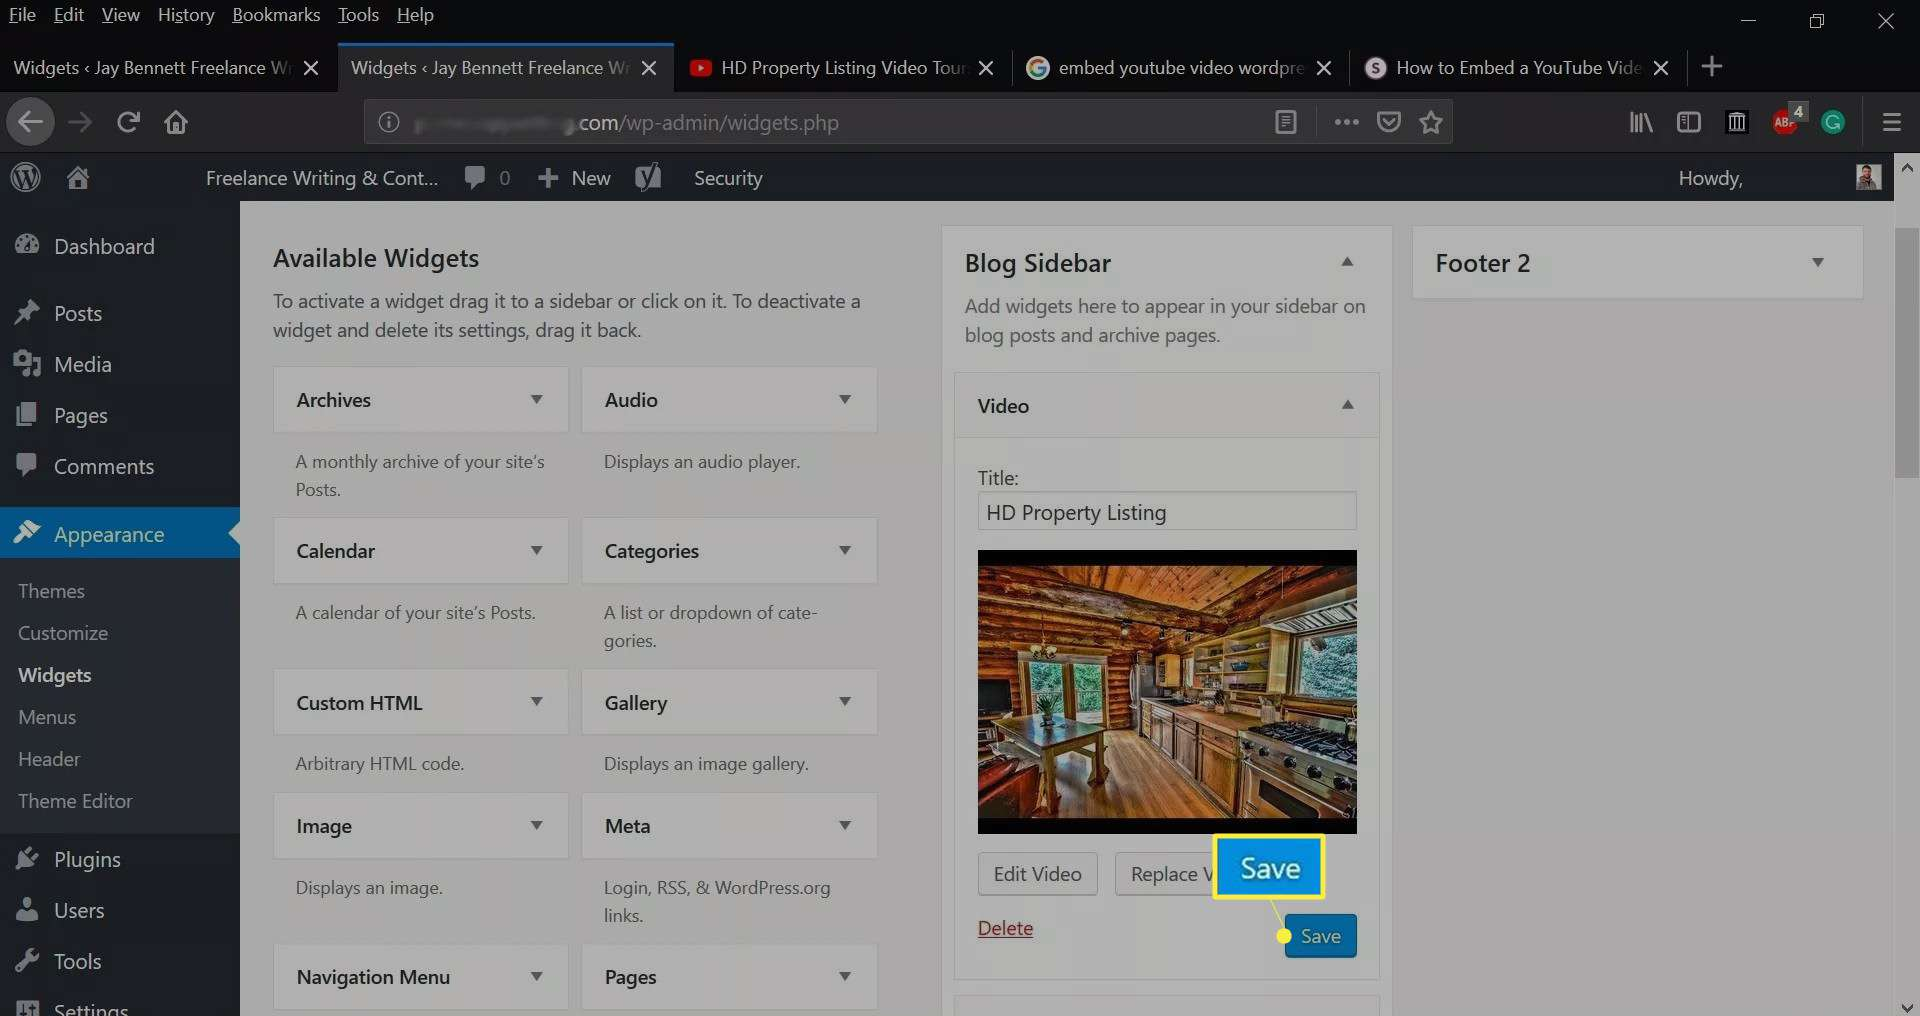 Save on the WordPress dashboard